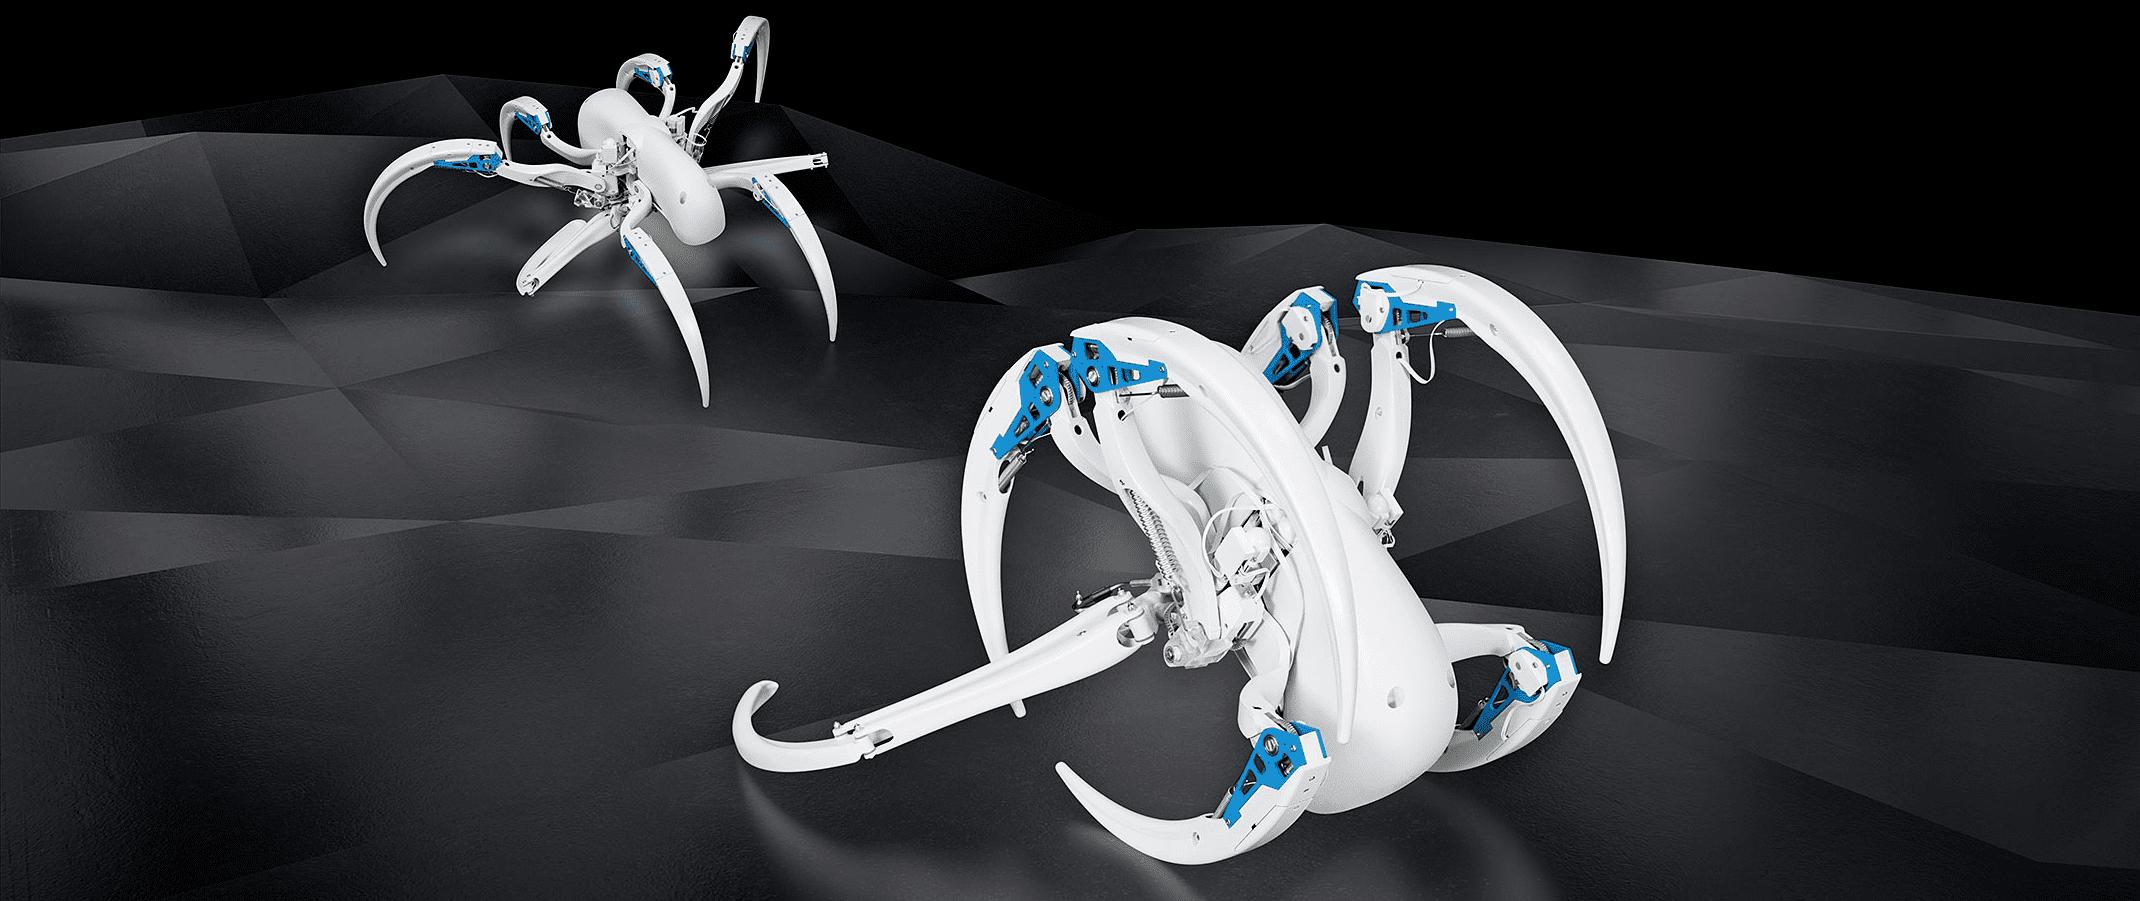 Бионический робот-колесо (BionicWheelBot)